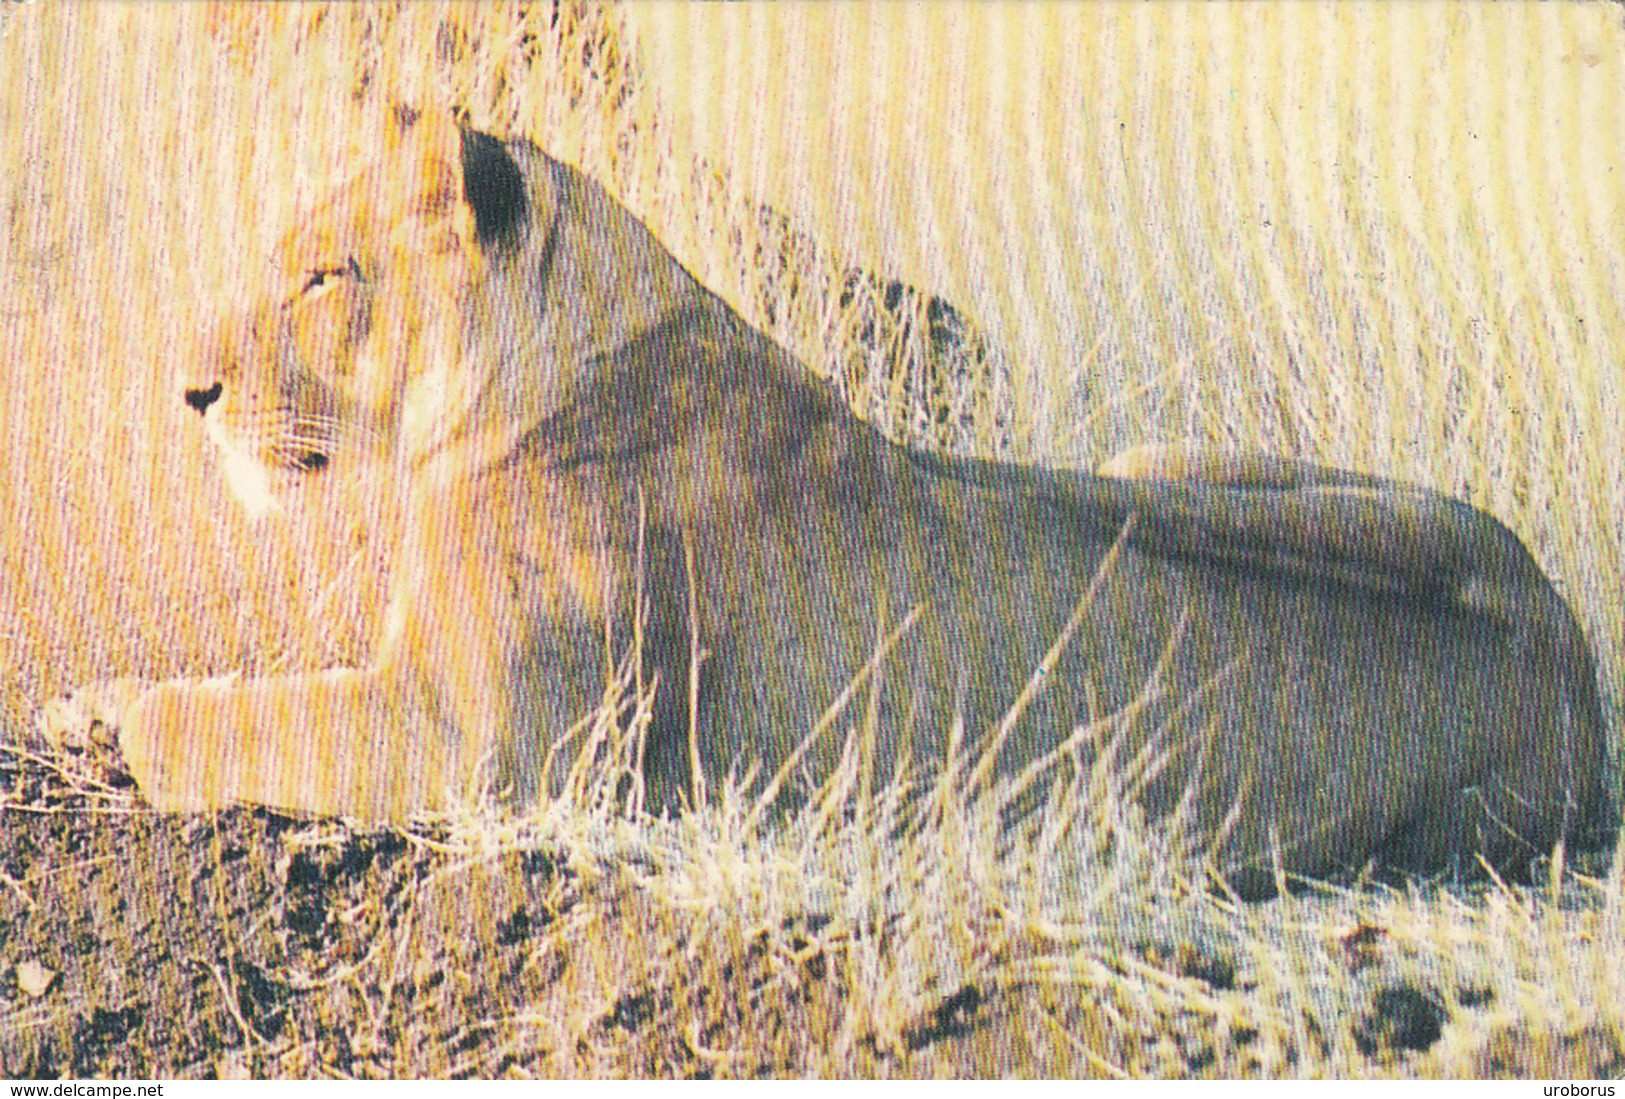 MALAWI - Lions Relaxing 1978 - Malawi